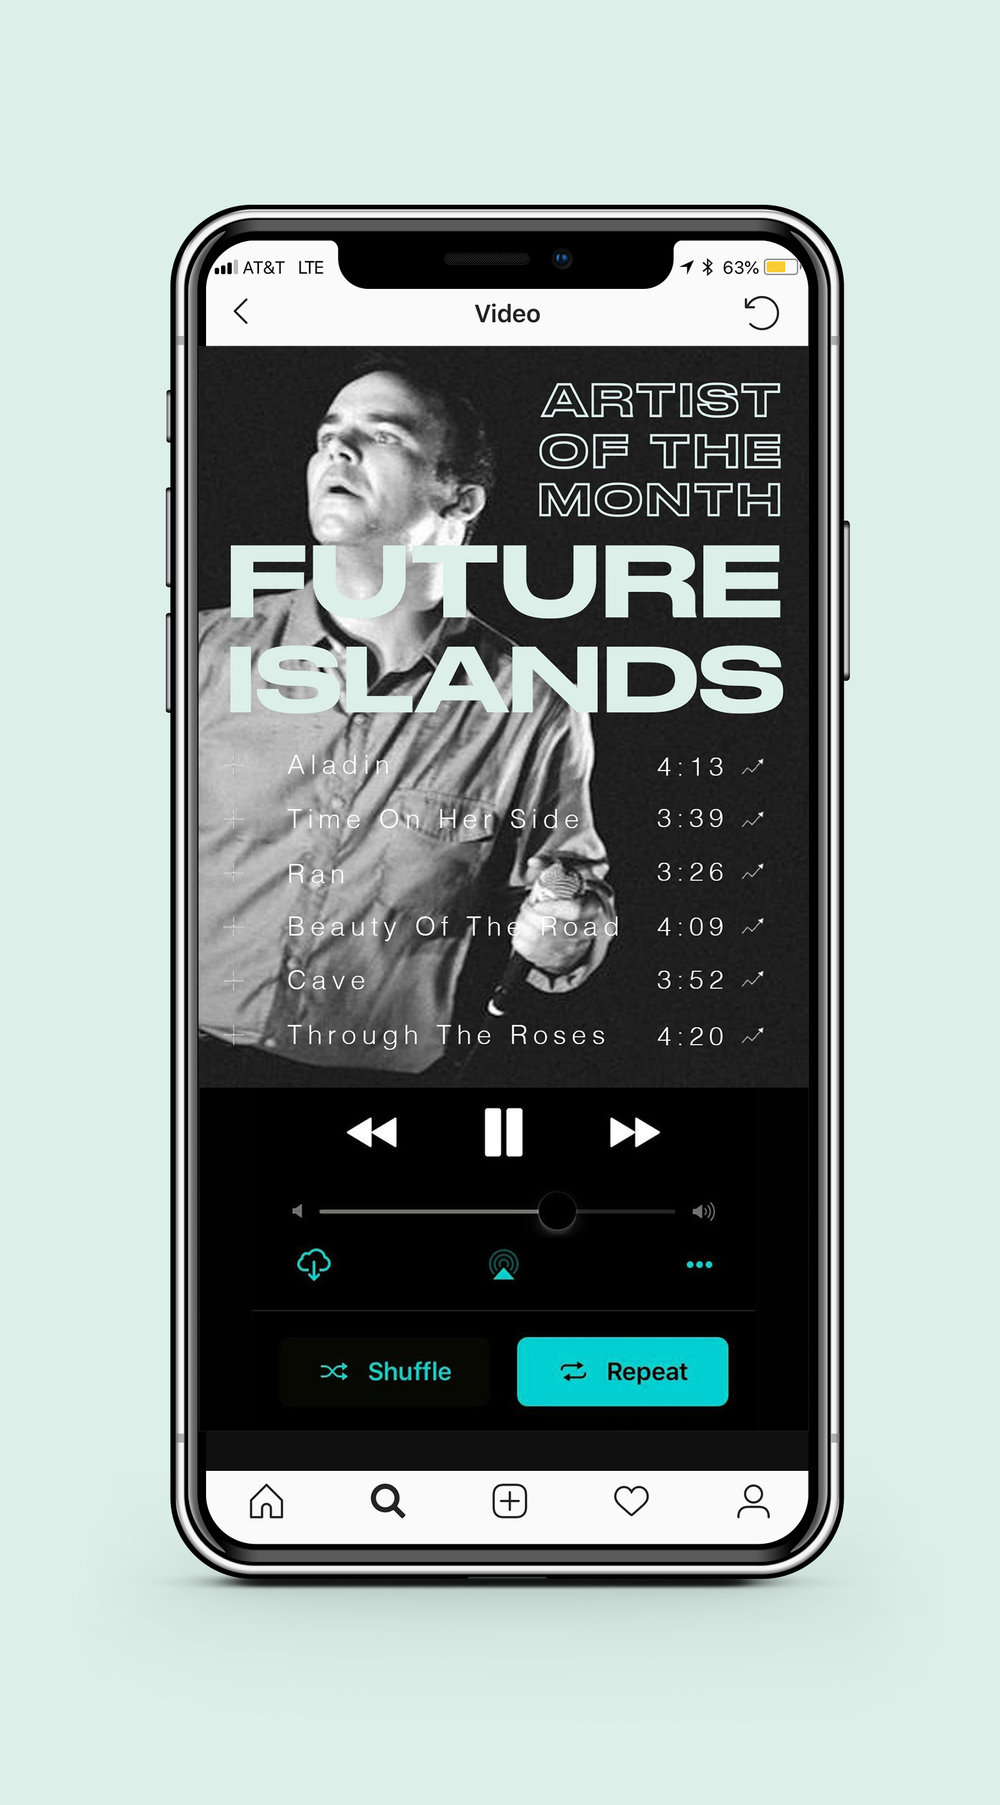 Future_islands_phone_mock.jpg